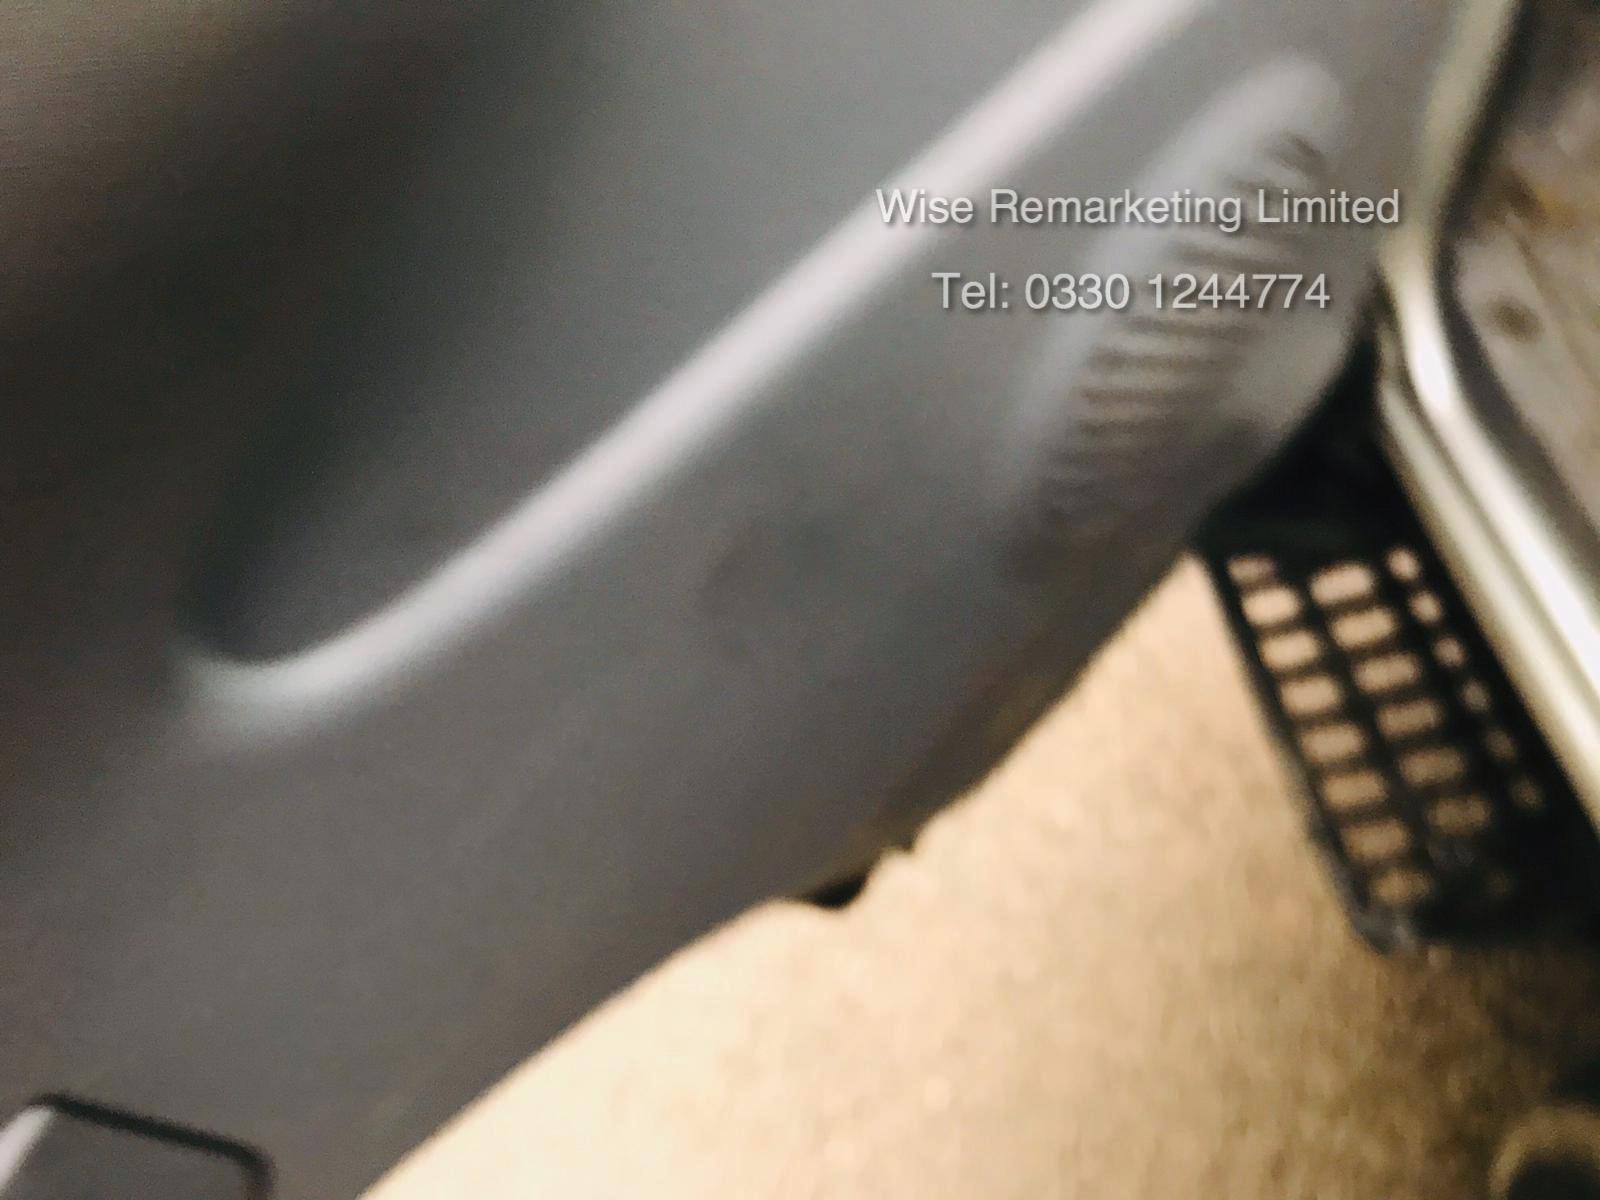 (RESERVE MET) Isuzu NKR 77 Turbo 3.0 DI (130 BHP) Luton - 2007 Reg - Tail Lift - Air Con NO VAT - Image 16 of 20